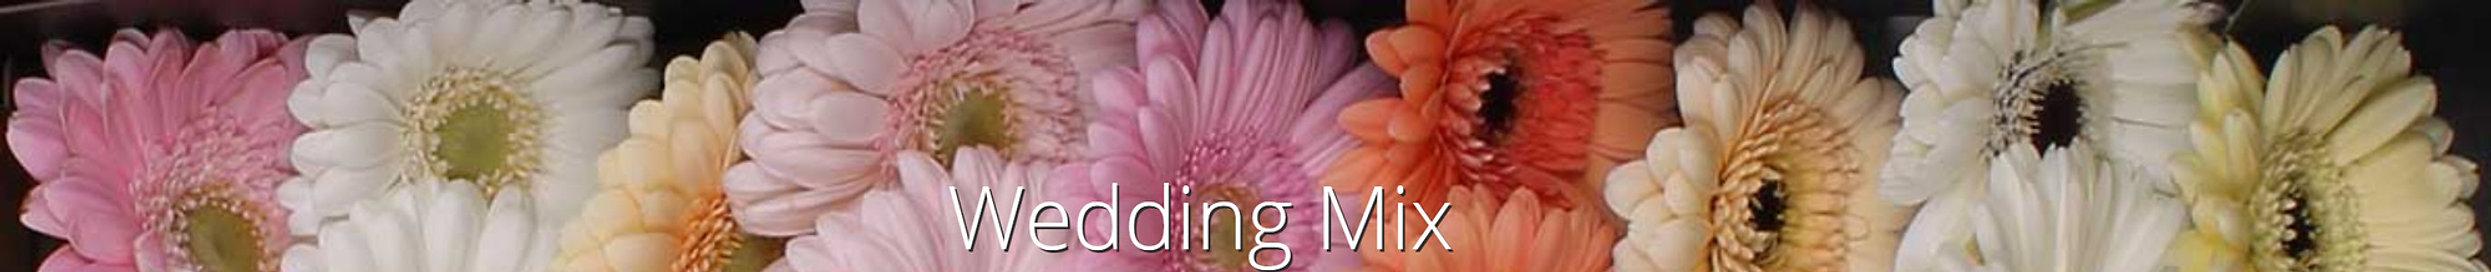 wedding mix.jpg